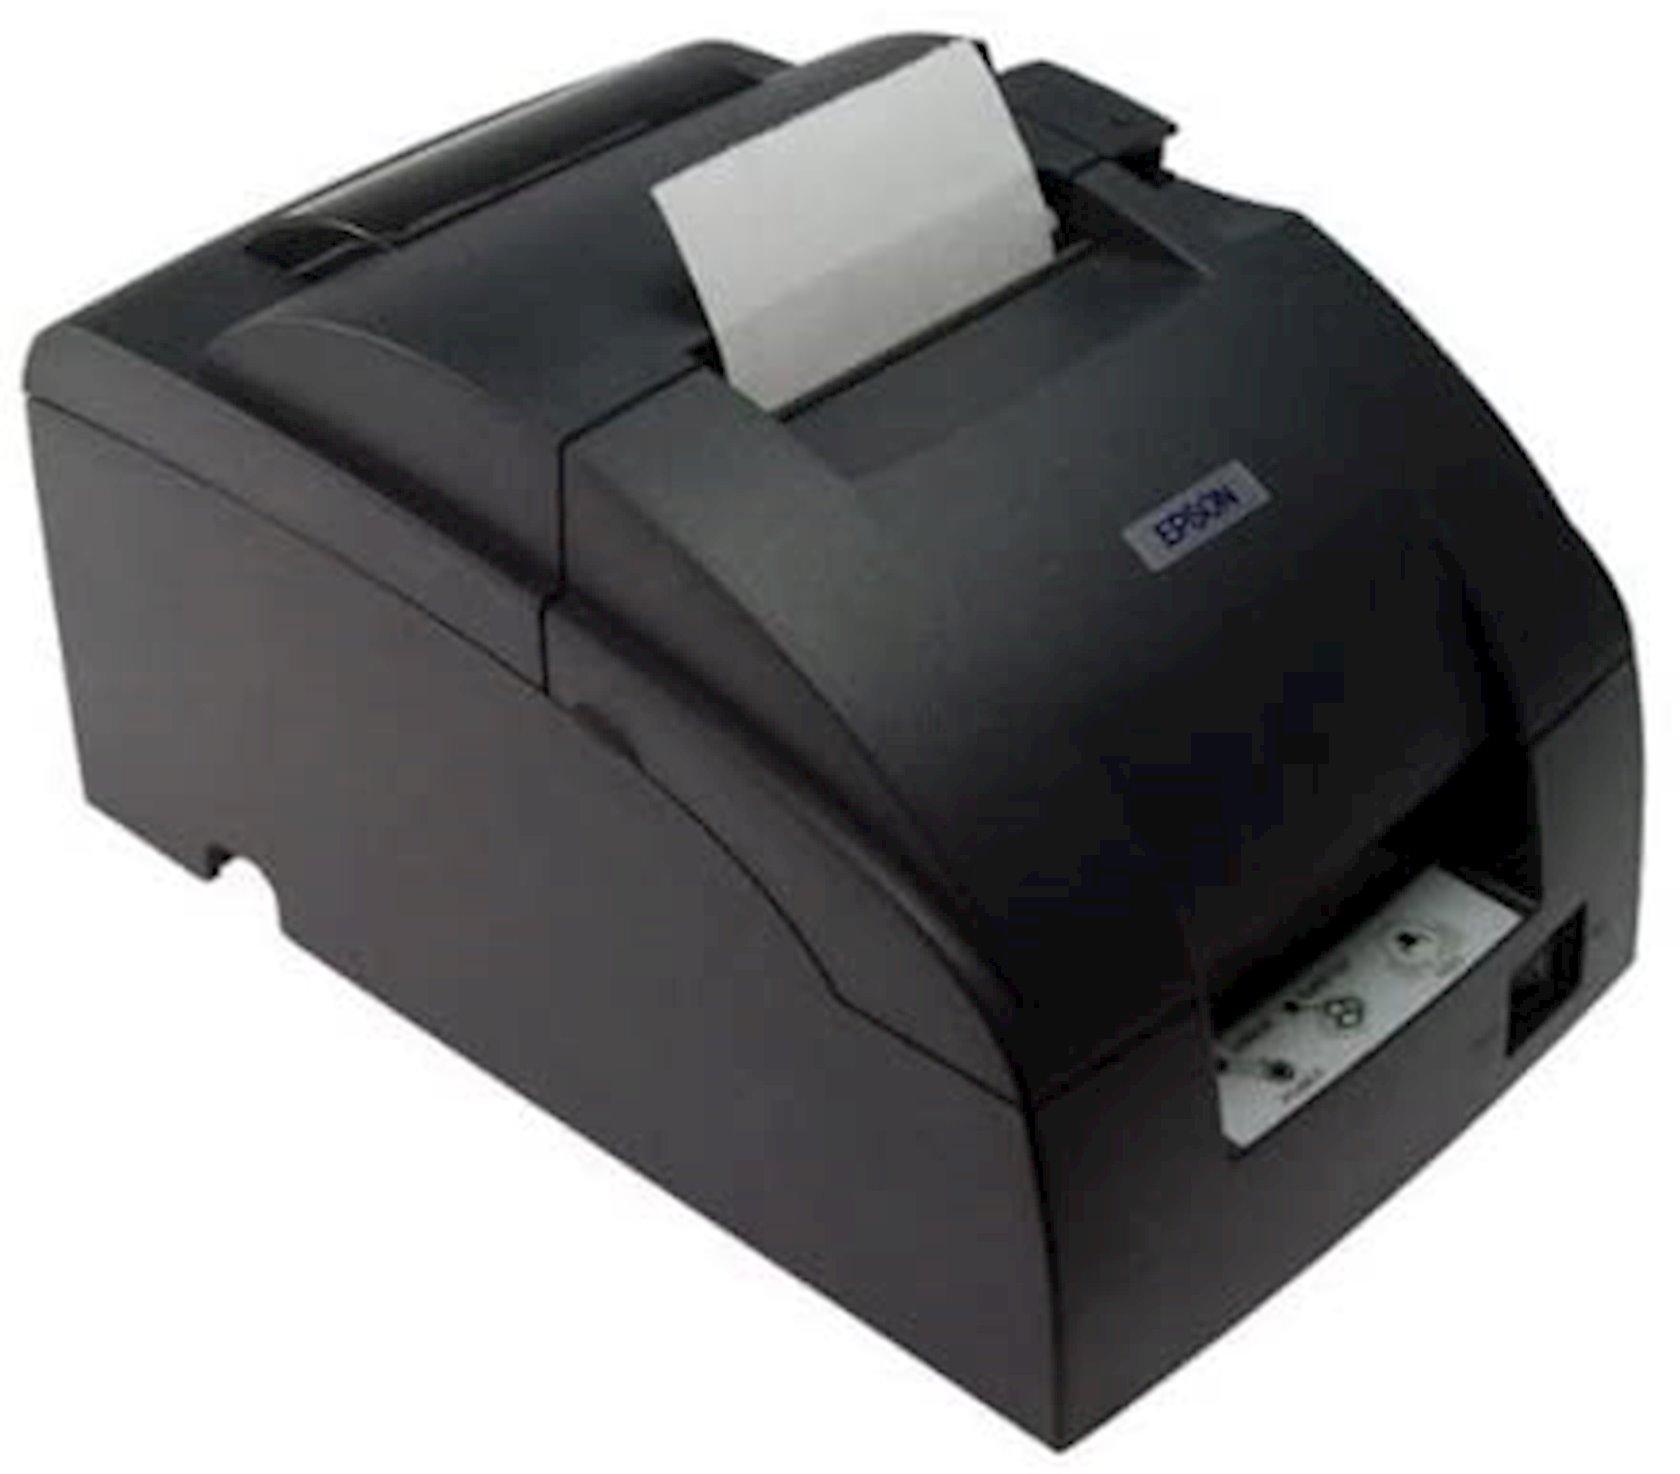 Çek printeri  Epson TM-U220B-057A0